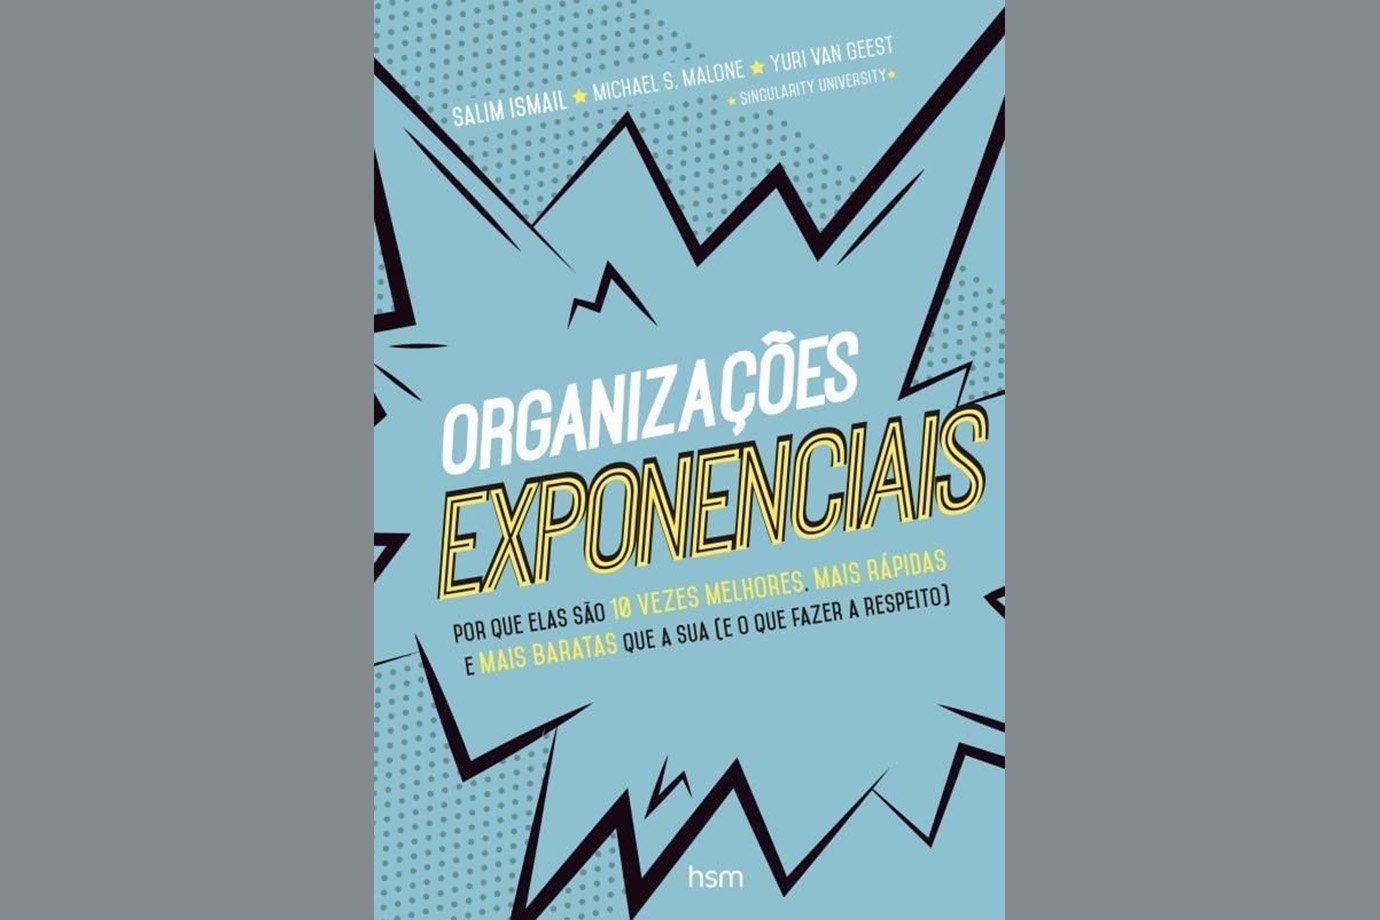 Organizações Exponenciais, de Michael S. Malone, Salim Ismail e Yuri Van Geest